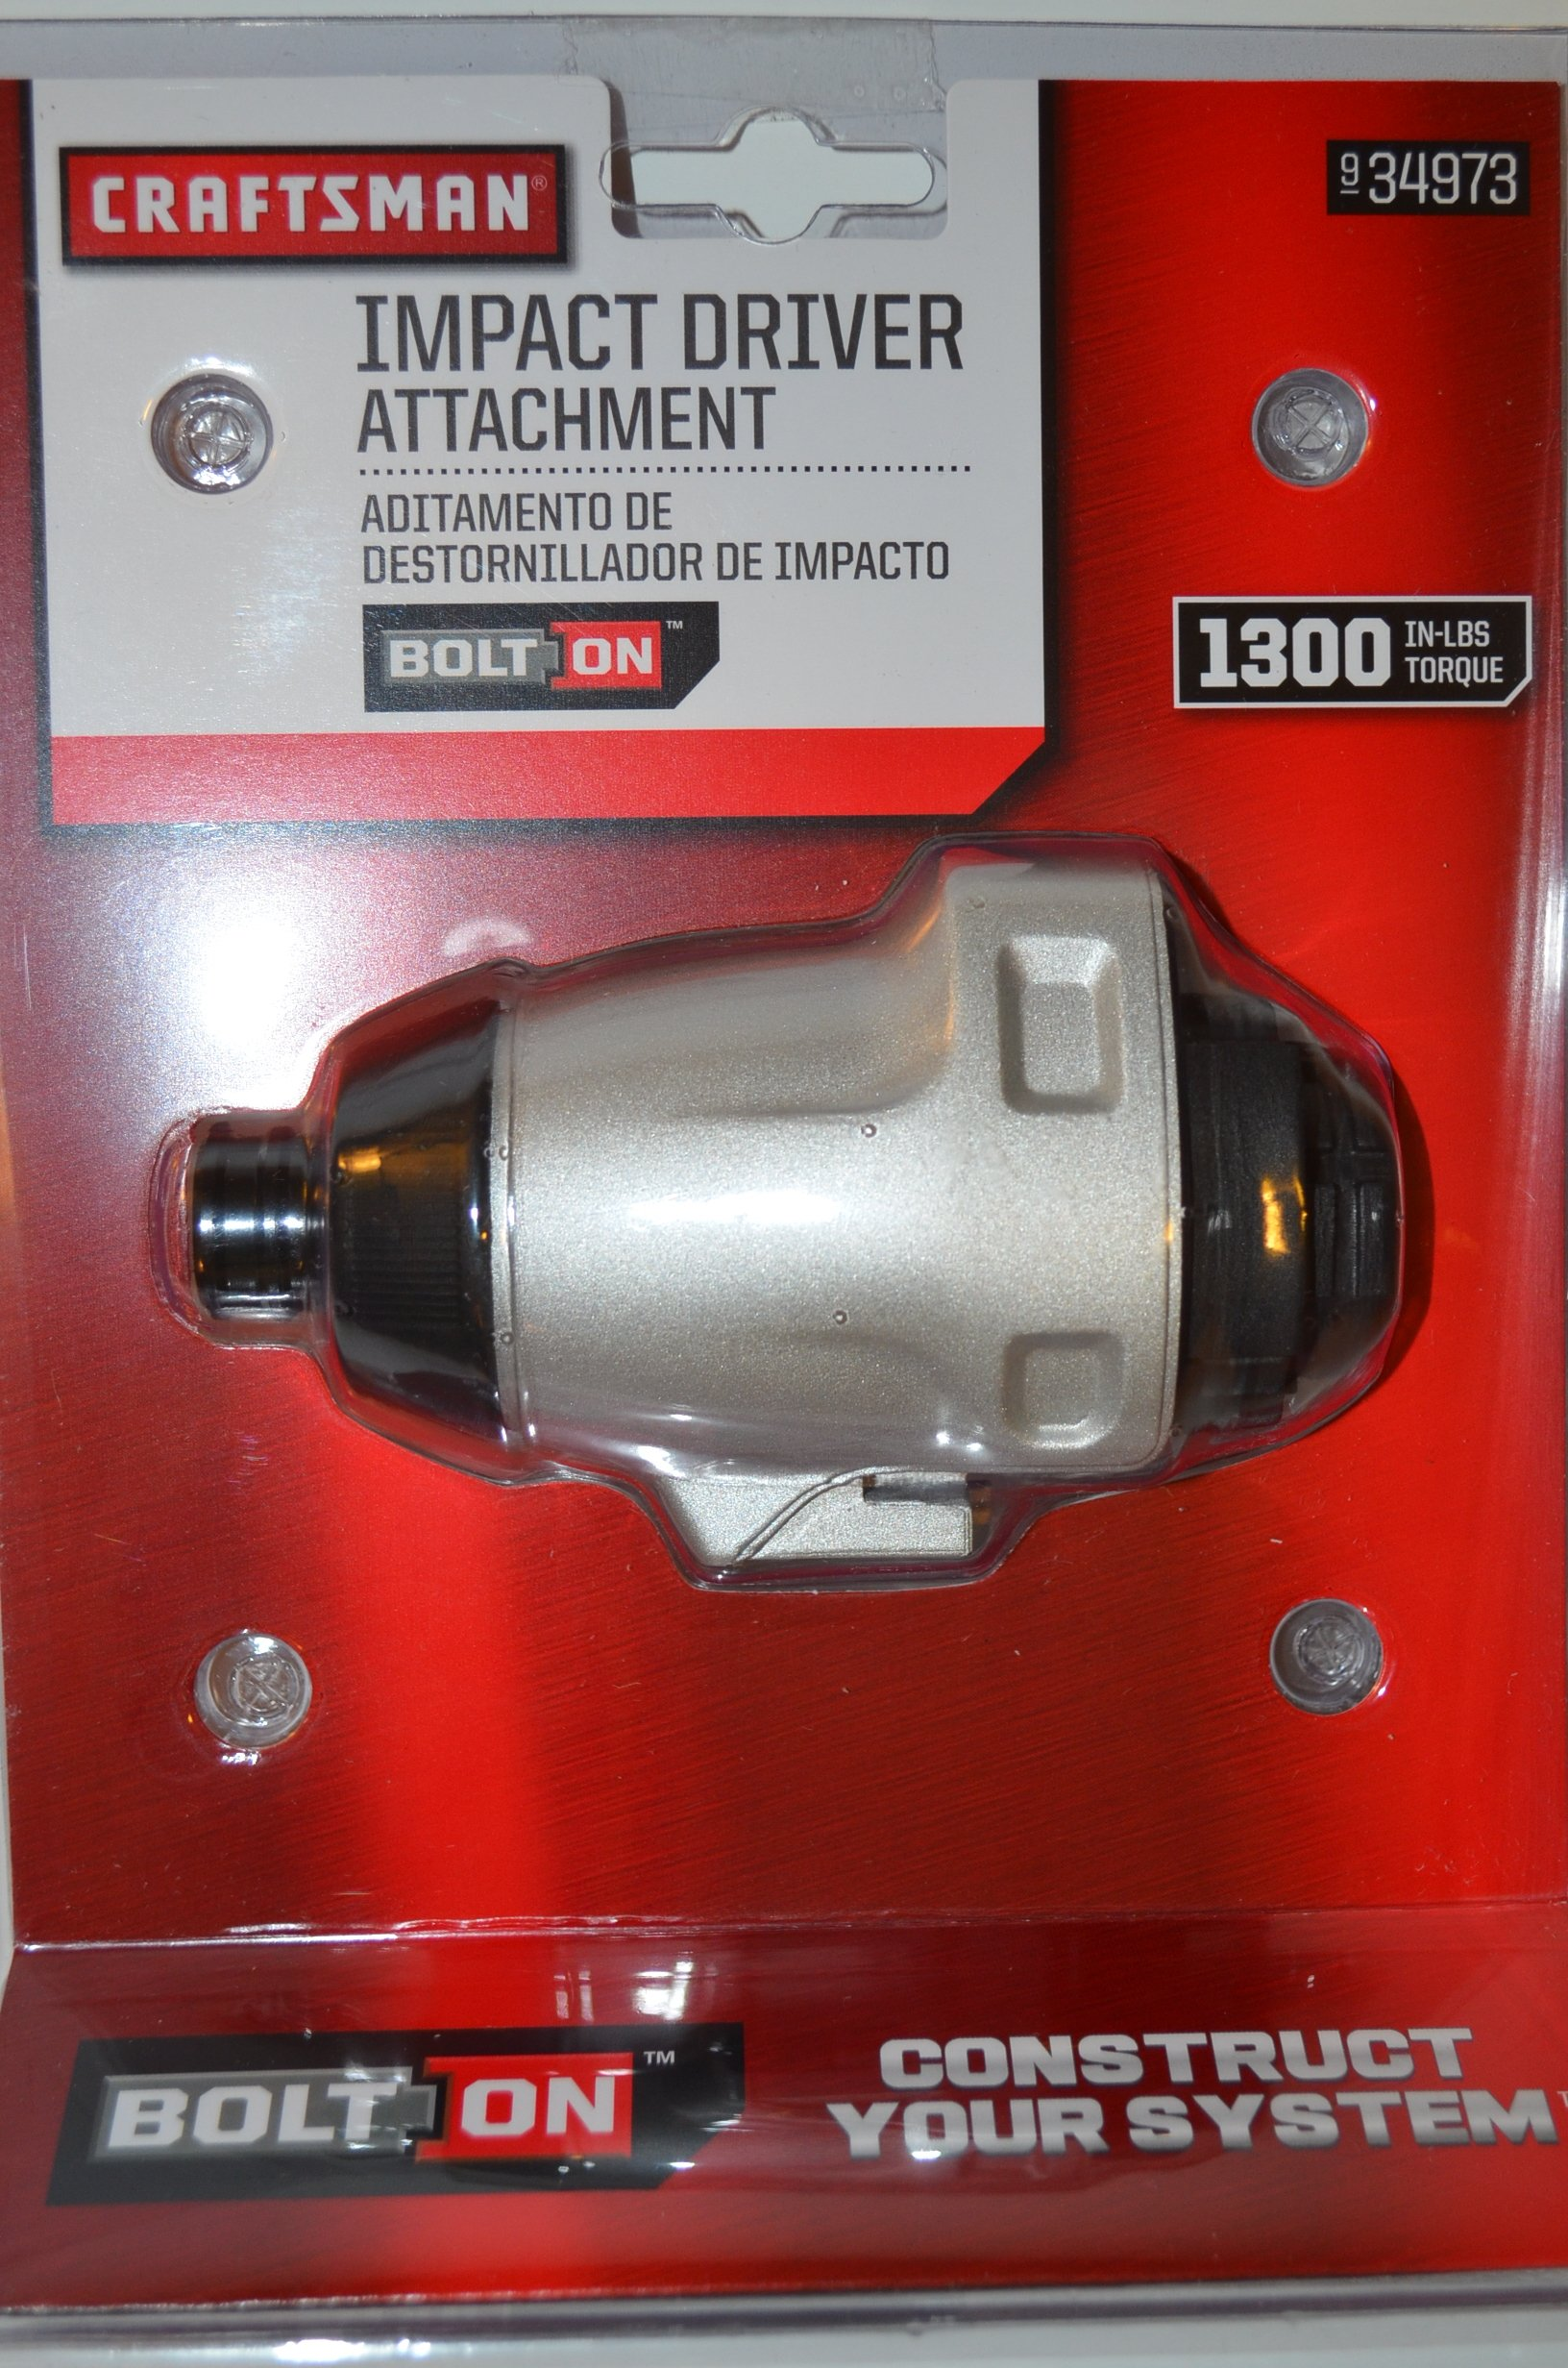 Craftsman 934973 Bolt-On 20v Lithium Ion Impact Drill//Driver Attachment Bolton